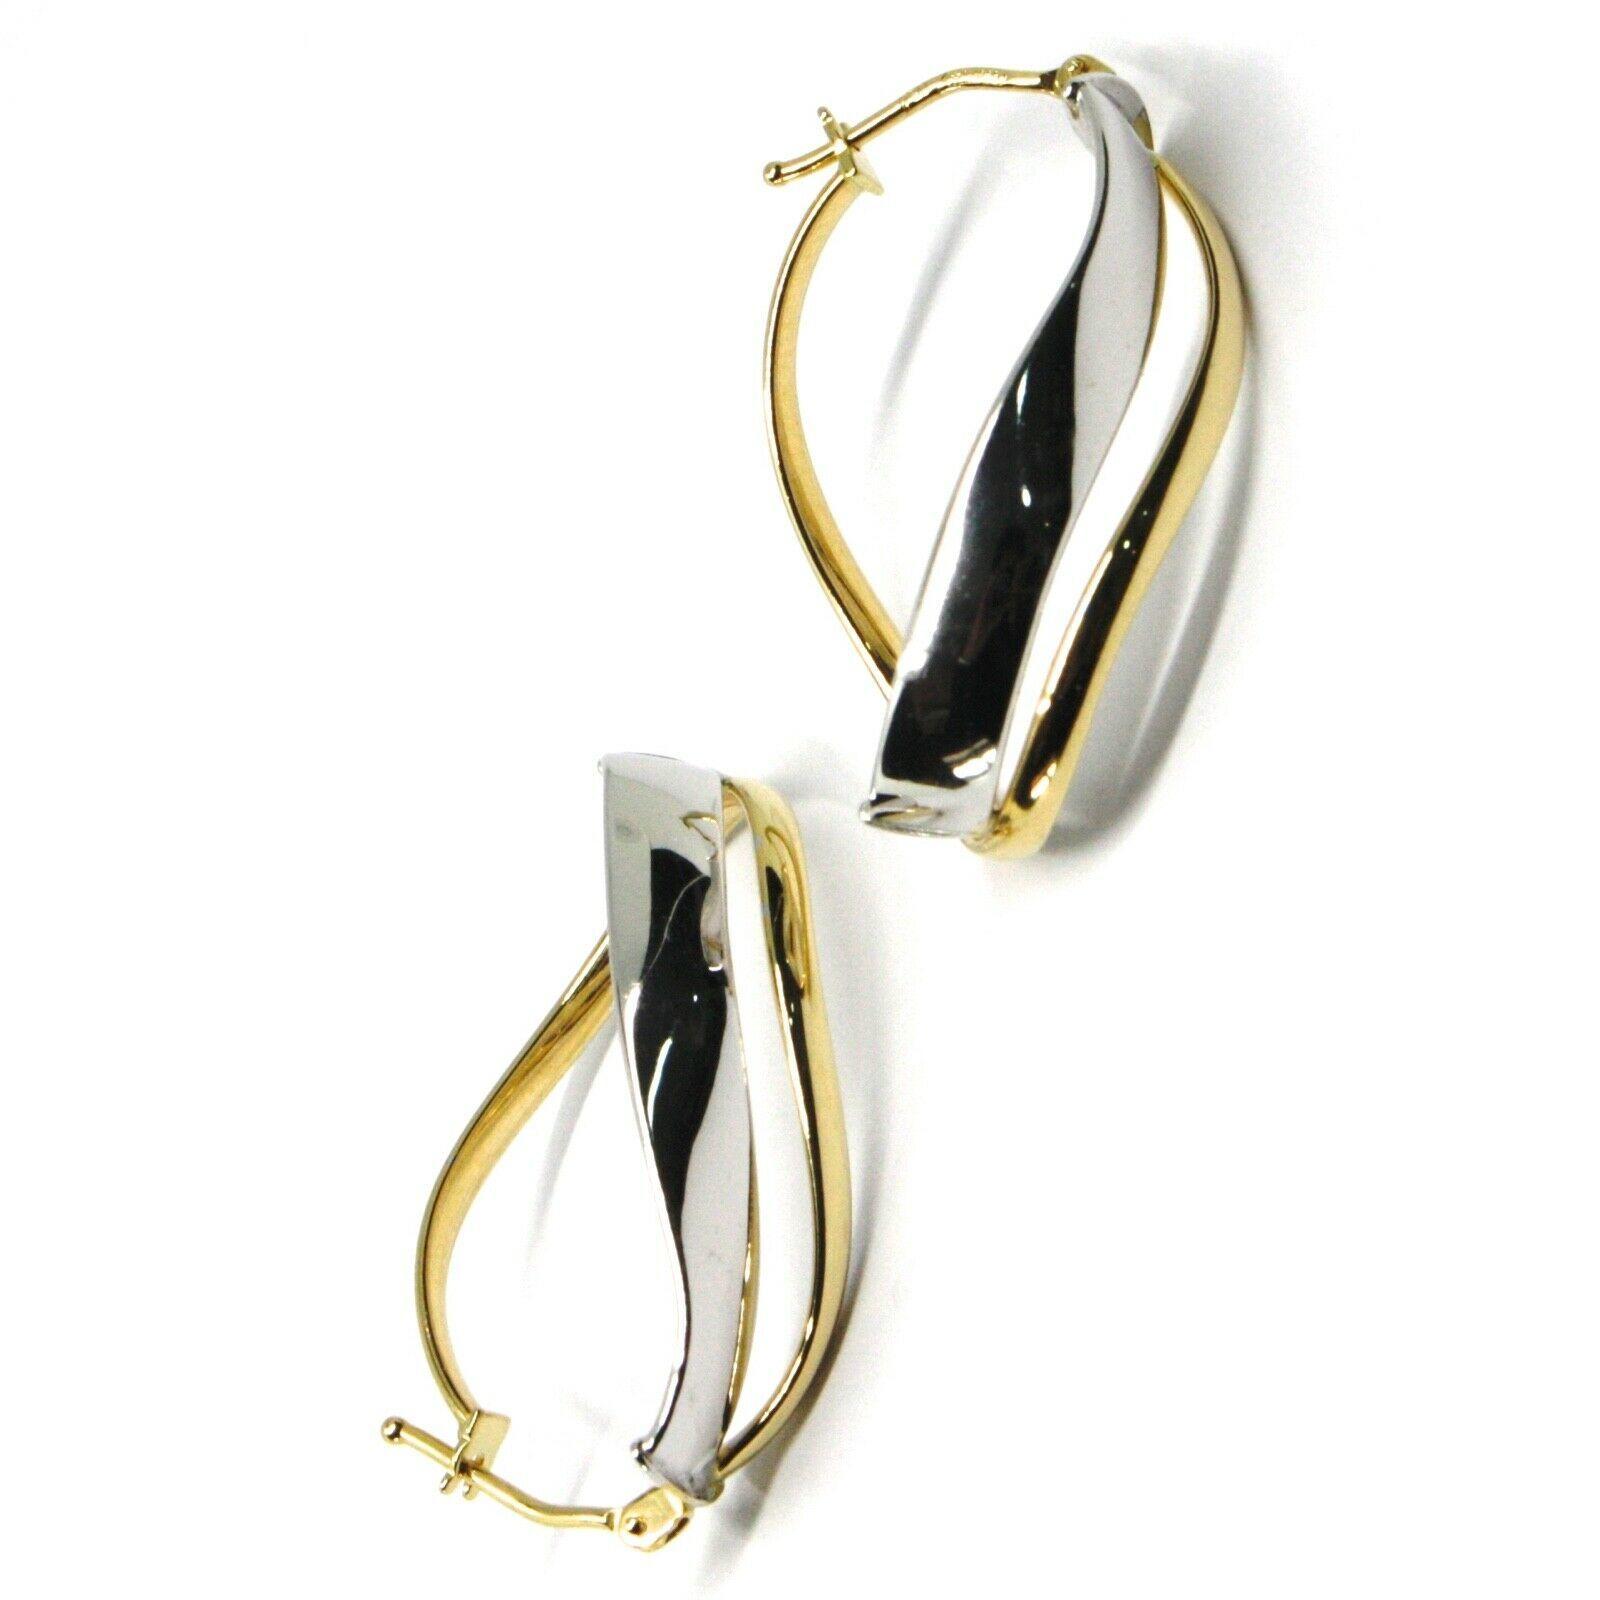 18K YELLOW WHITE GOLD PENDANT EARRINGS ONDULATE OVAL DOUBLE TUBE HOOPS 2.9cm